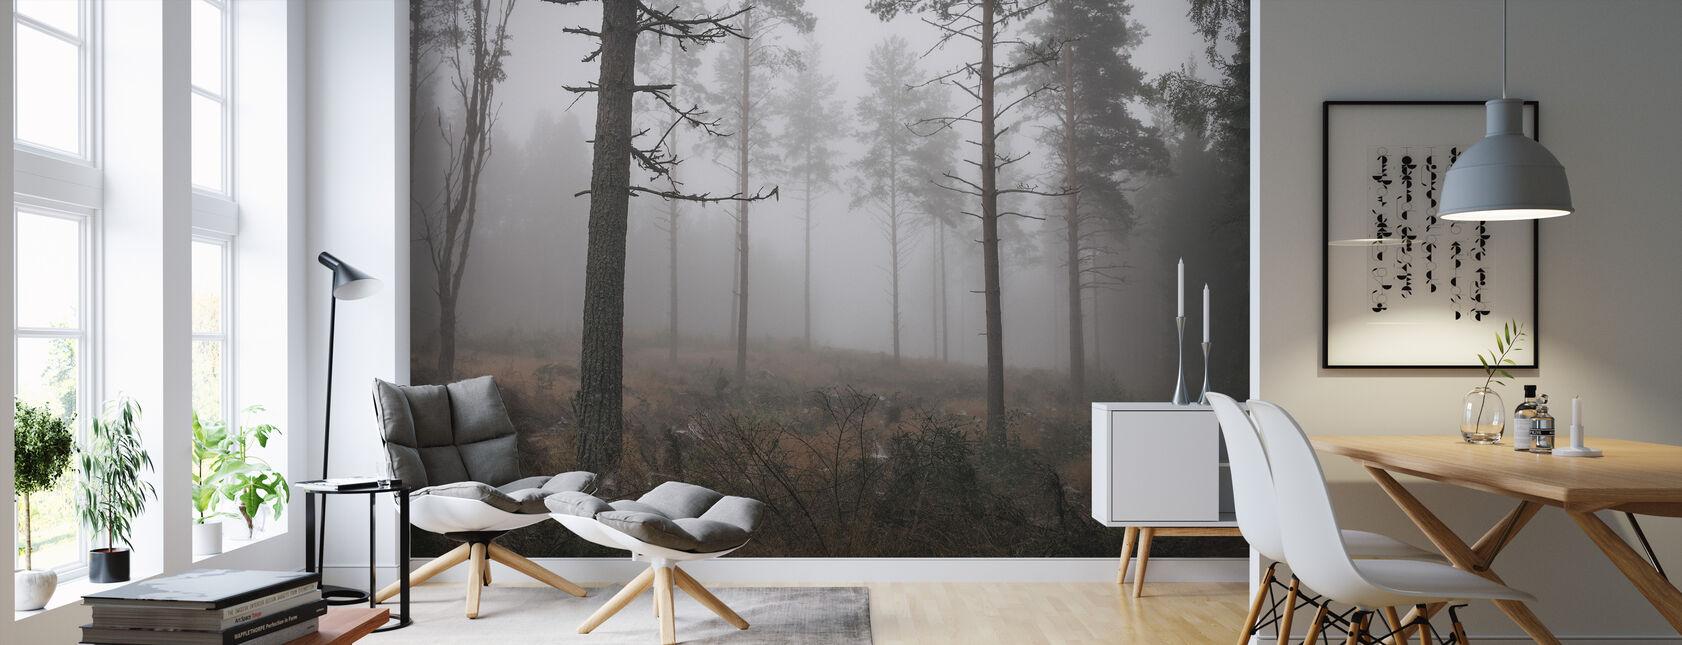 Early Spring - Wallpaper - Living Room